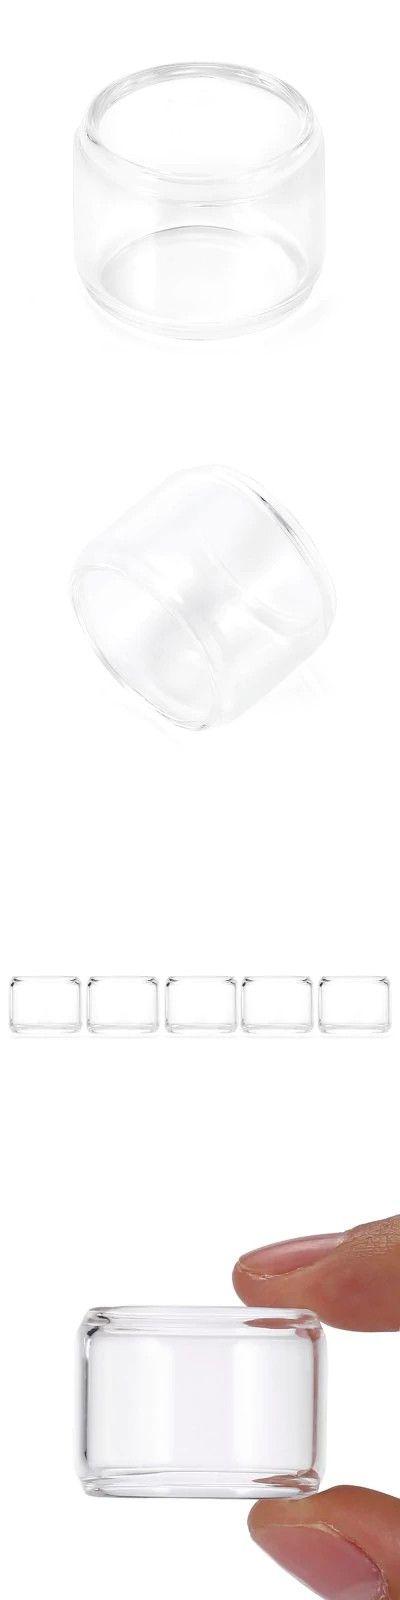 Glass Tank for TFV8 Big Baby 5PCS -$6.26